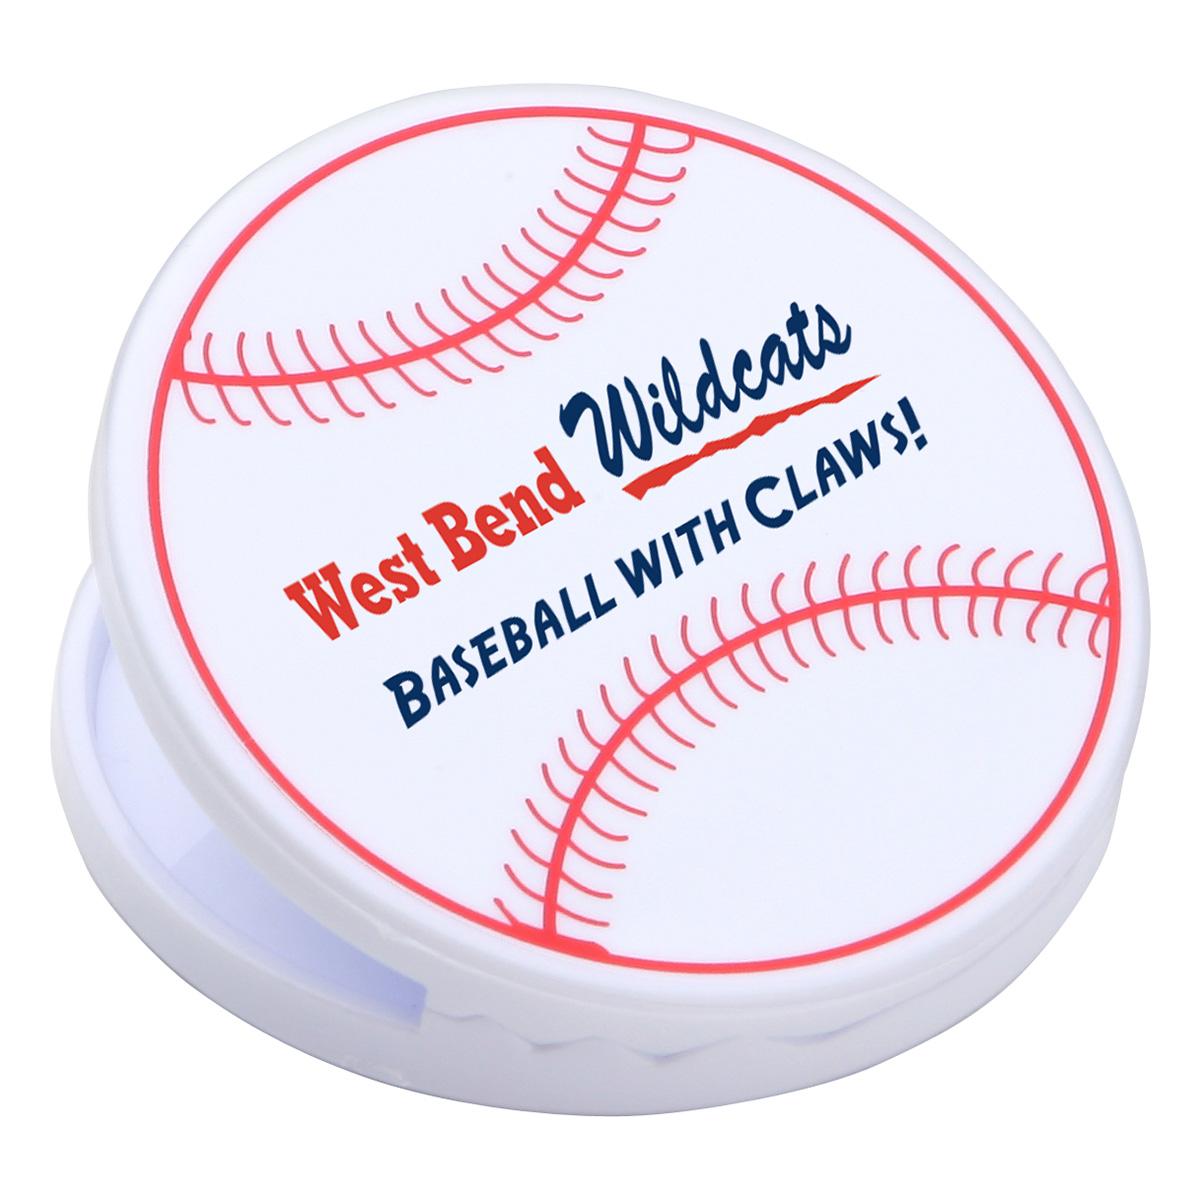 Baseball Power Clip, WMG-BA12 - 1 Colour Imprint